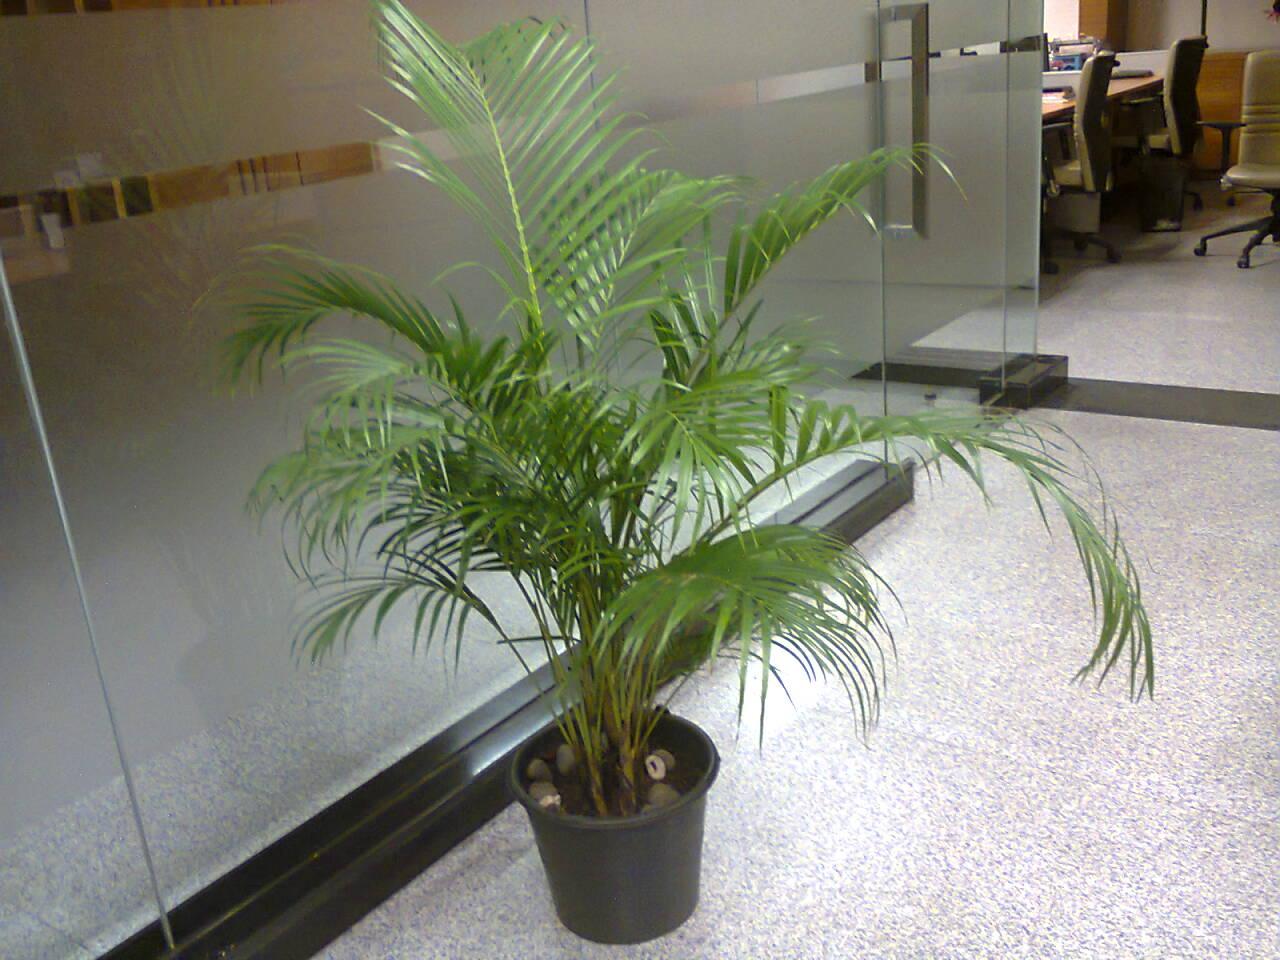 Rental tanaman Palem Kuning | Ukuran Standar